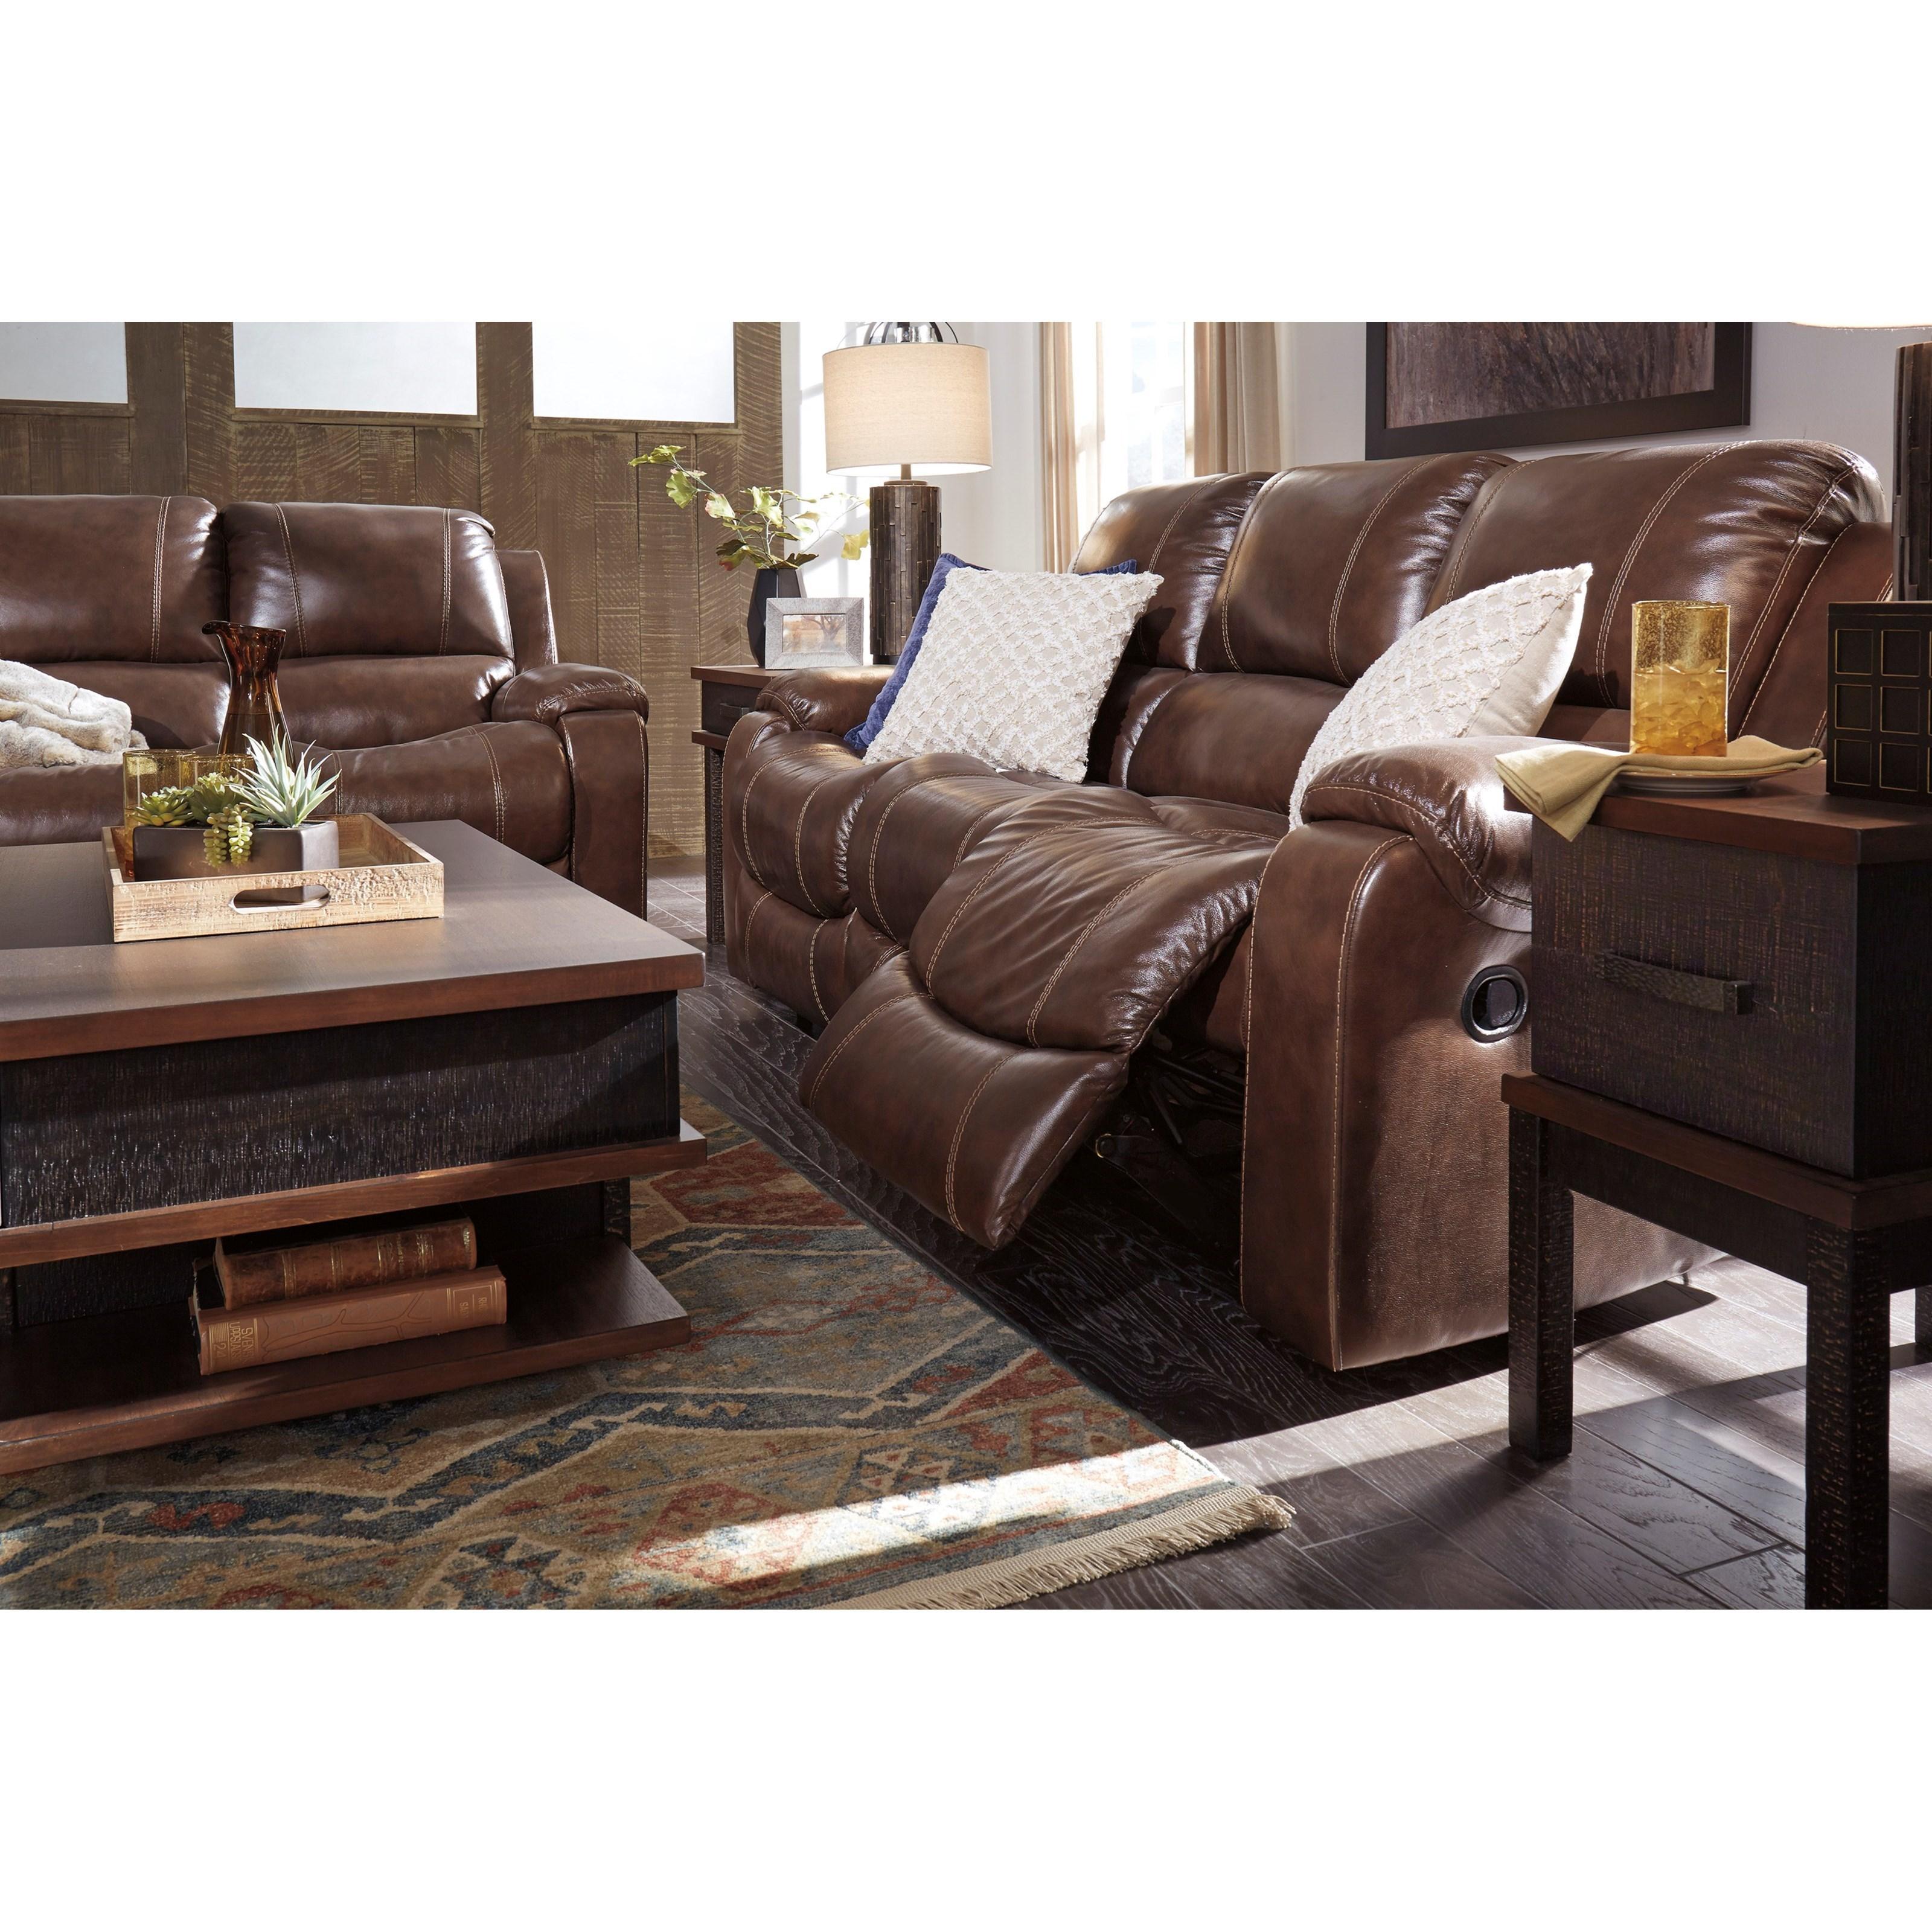 Signature Design Couch: Signature Design By Ashley Rackingburg U3330188 Reclining